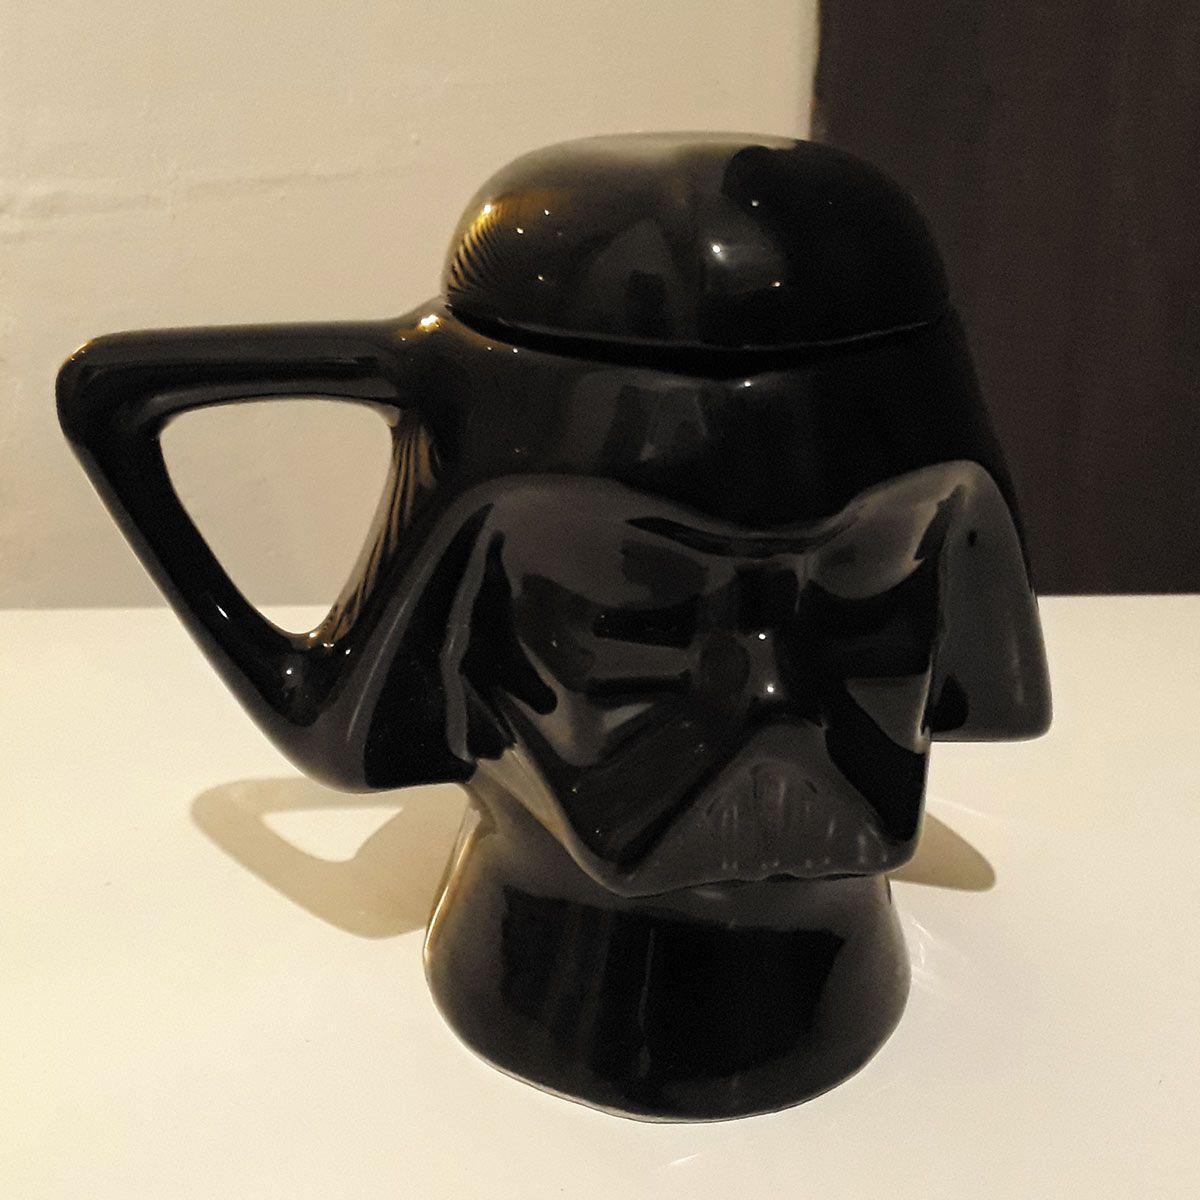 Caneca Cerâmica com Tampa Capacete Darth Vader Star Wars 3D